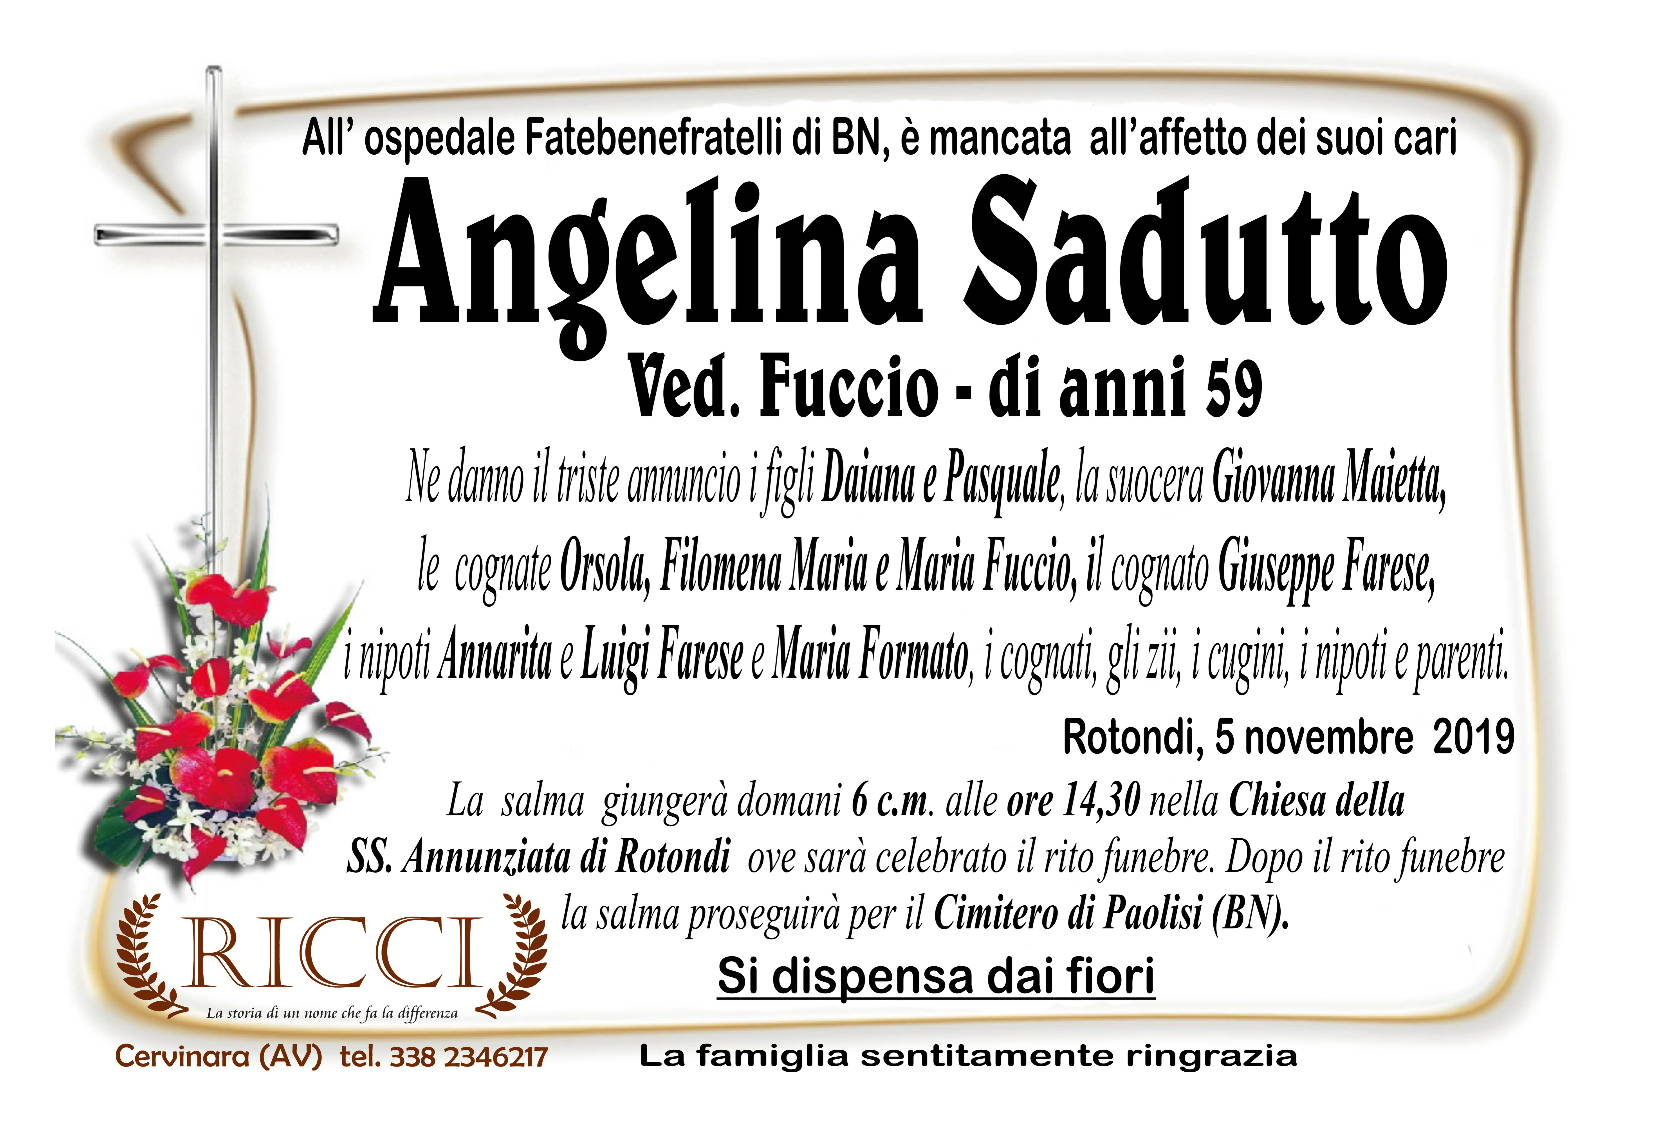 Angelina Sadutto